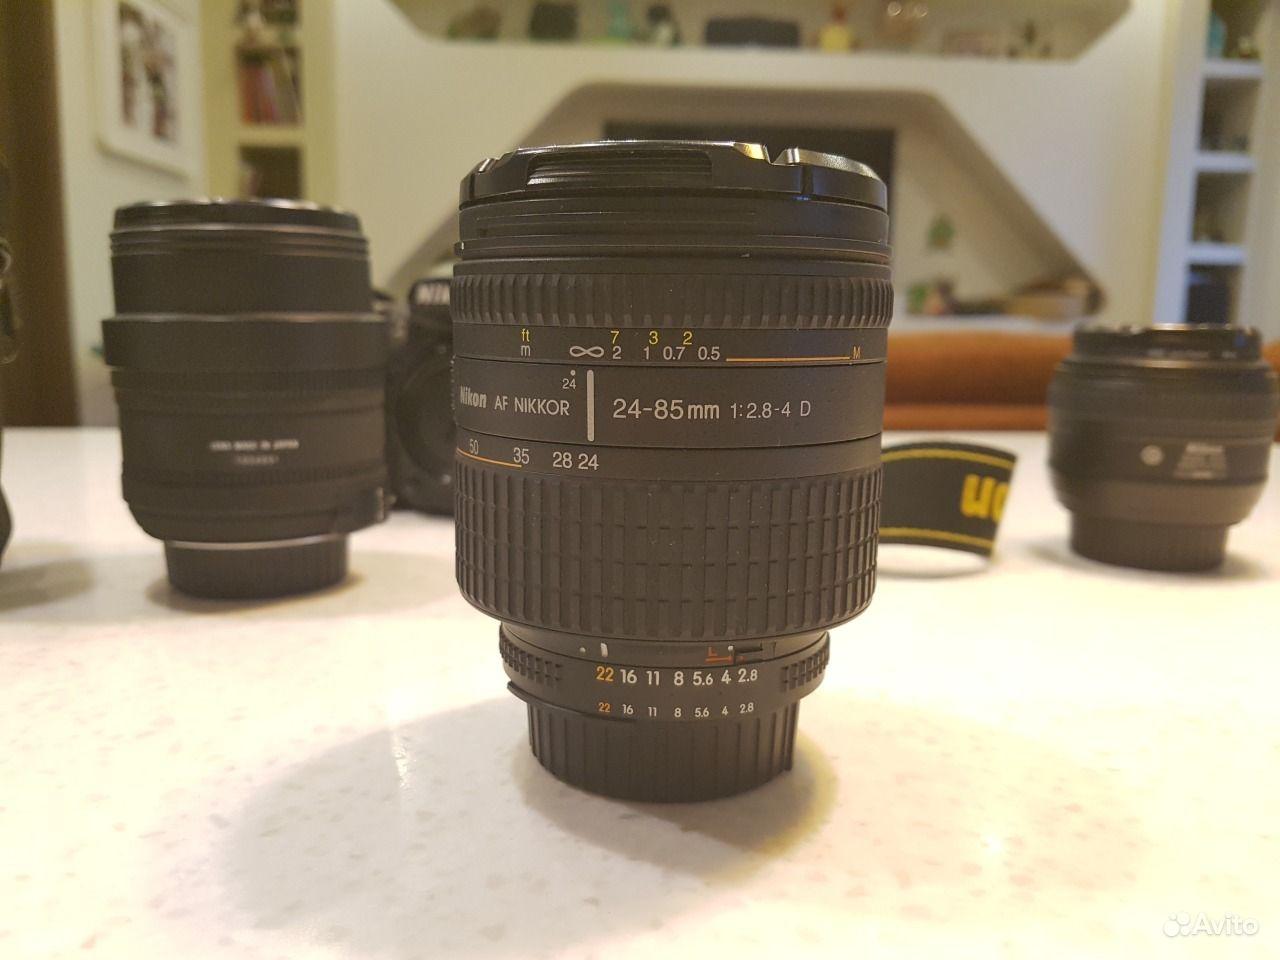 Jual Murah Nikon Af 24 85mm F28 4d If Termurah 2018 Produk Ukm Bumn Nabilla Biru Donker Ty Hijab F 28 Zoom Nikkor